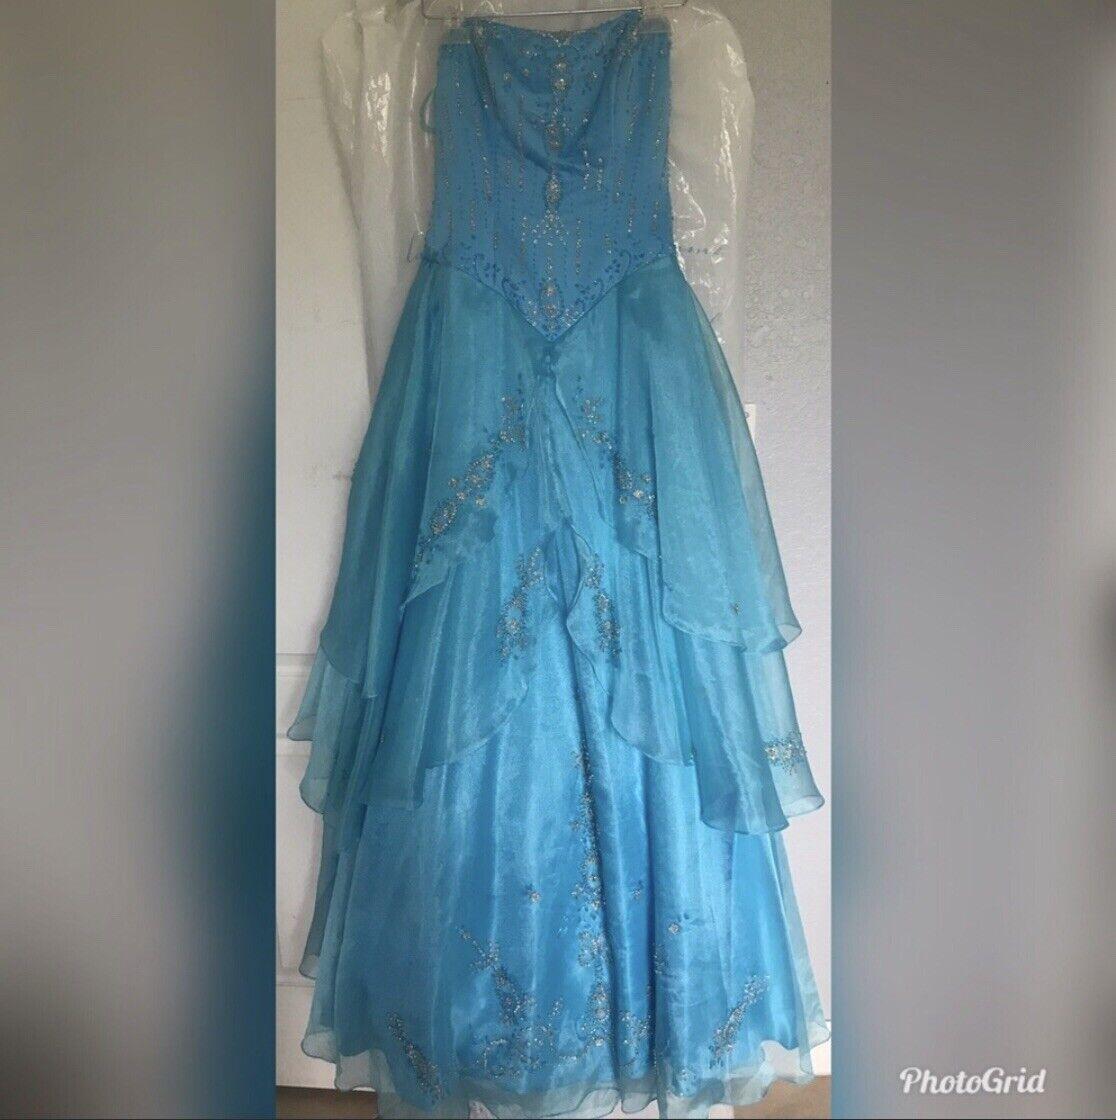 blue ball gown dress - image 1